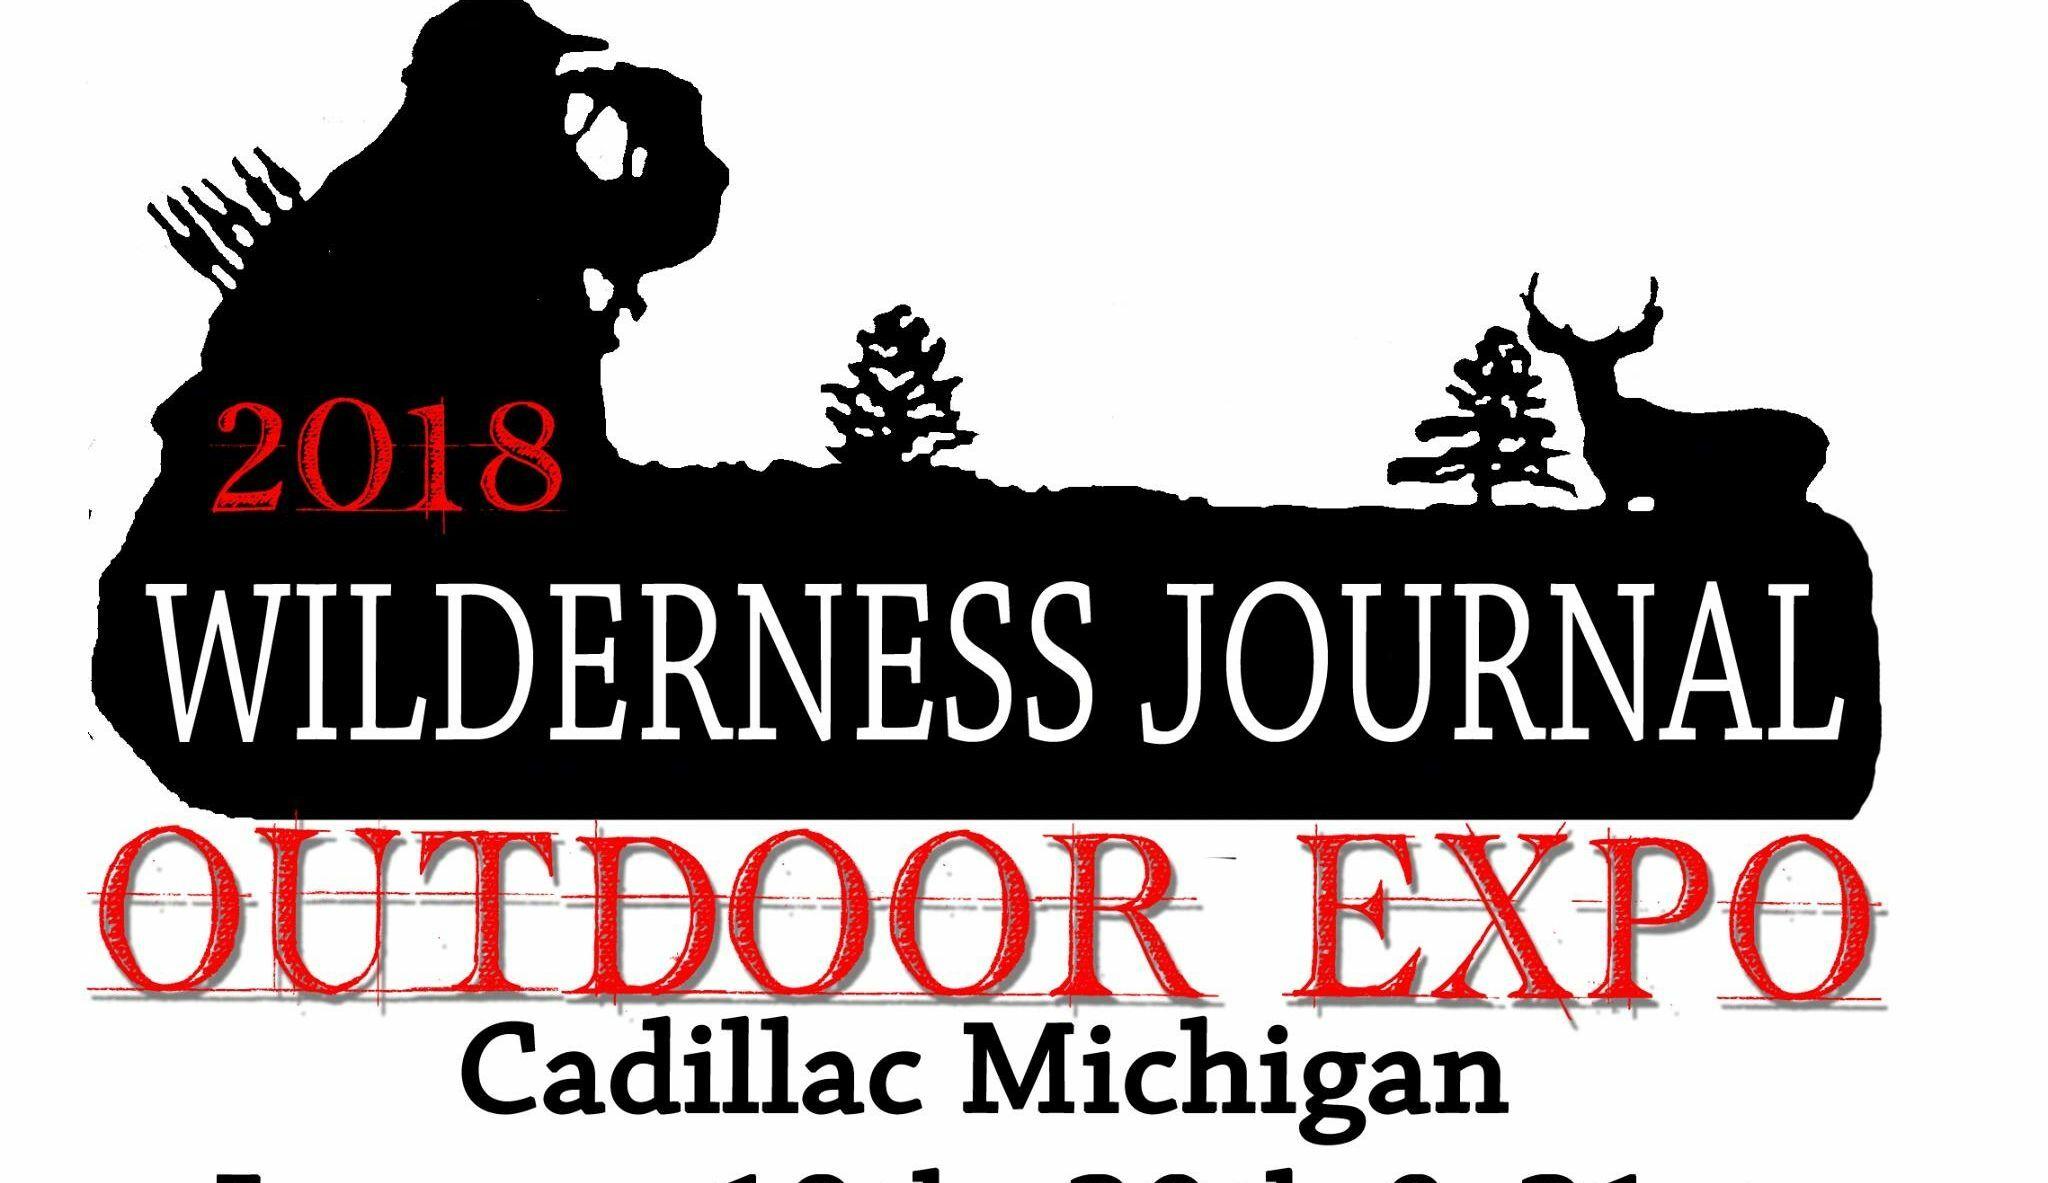 Events and Festivals Cadillac Michigan - Cadillac